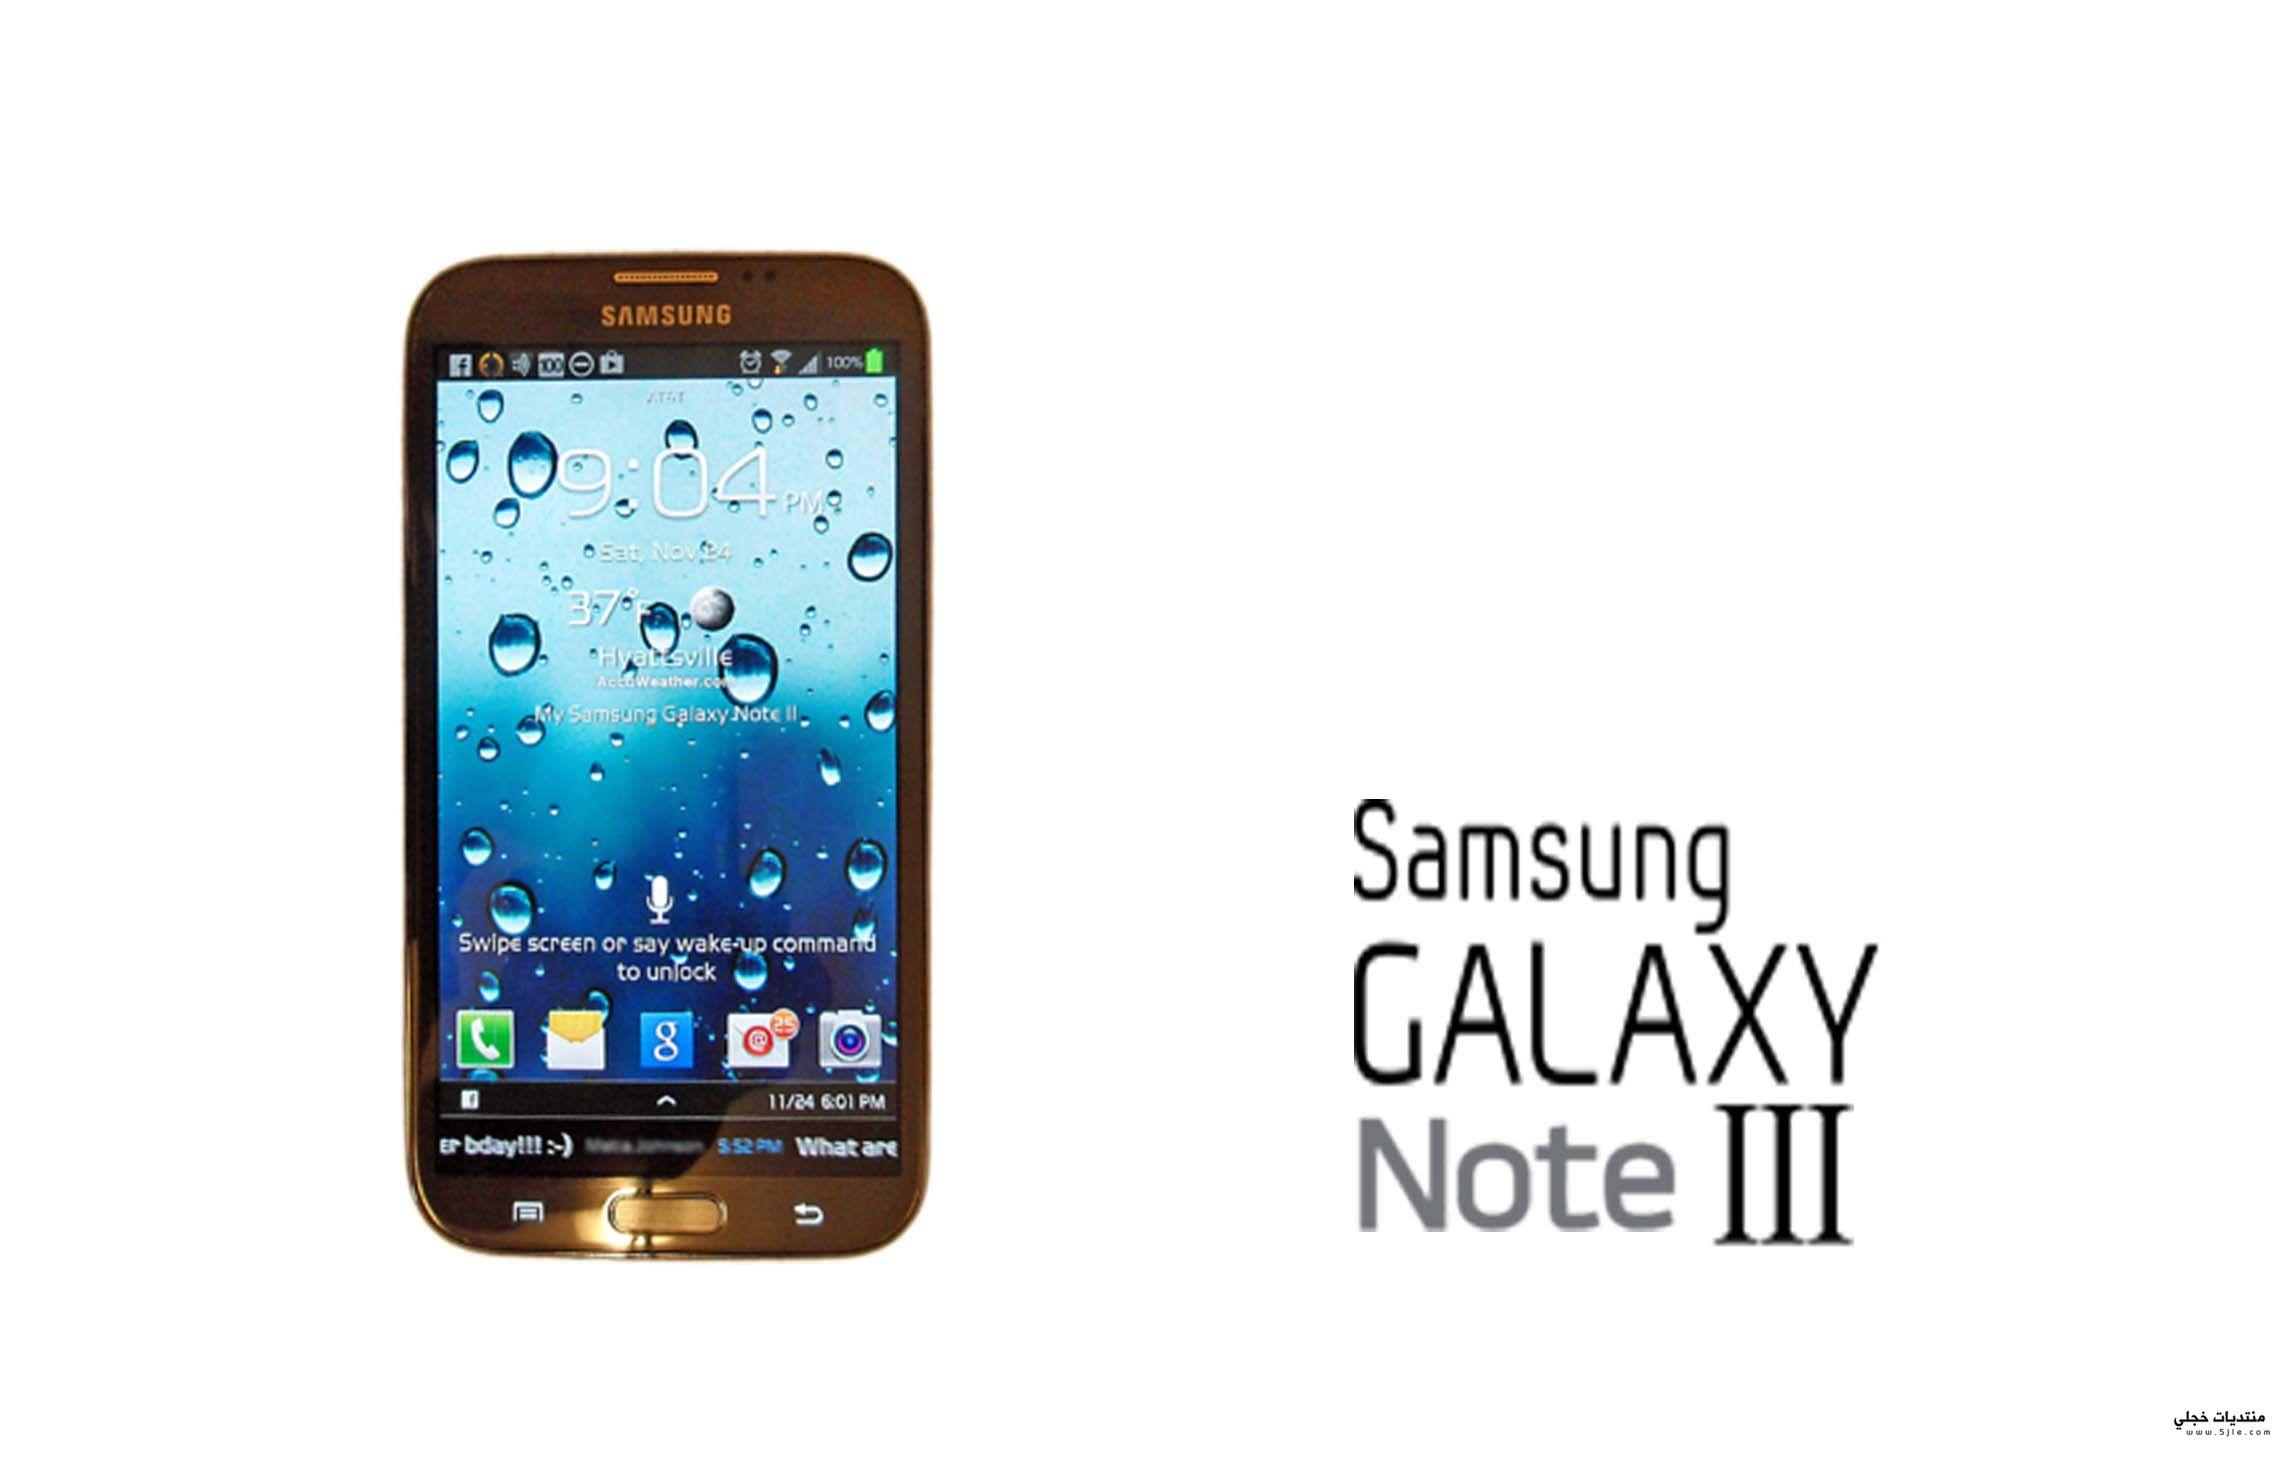 ������ galaxy note ������ �������